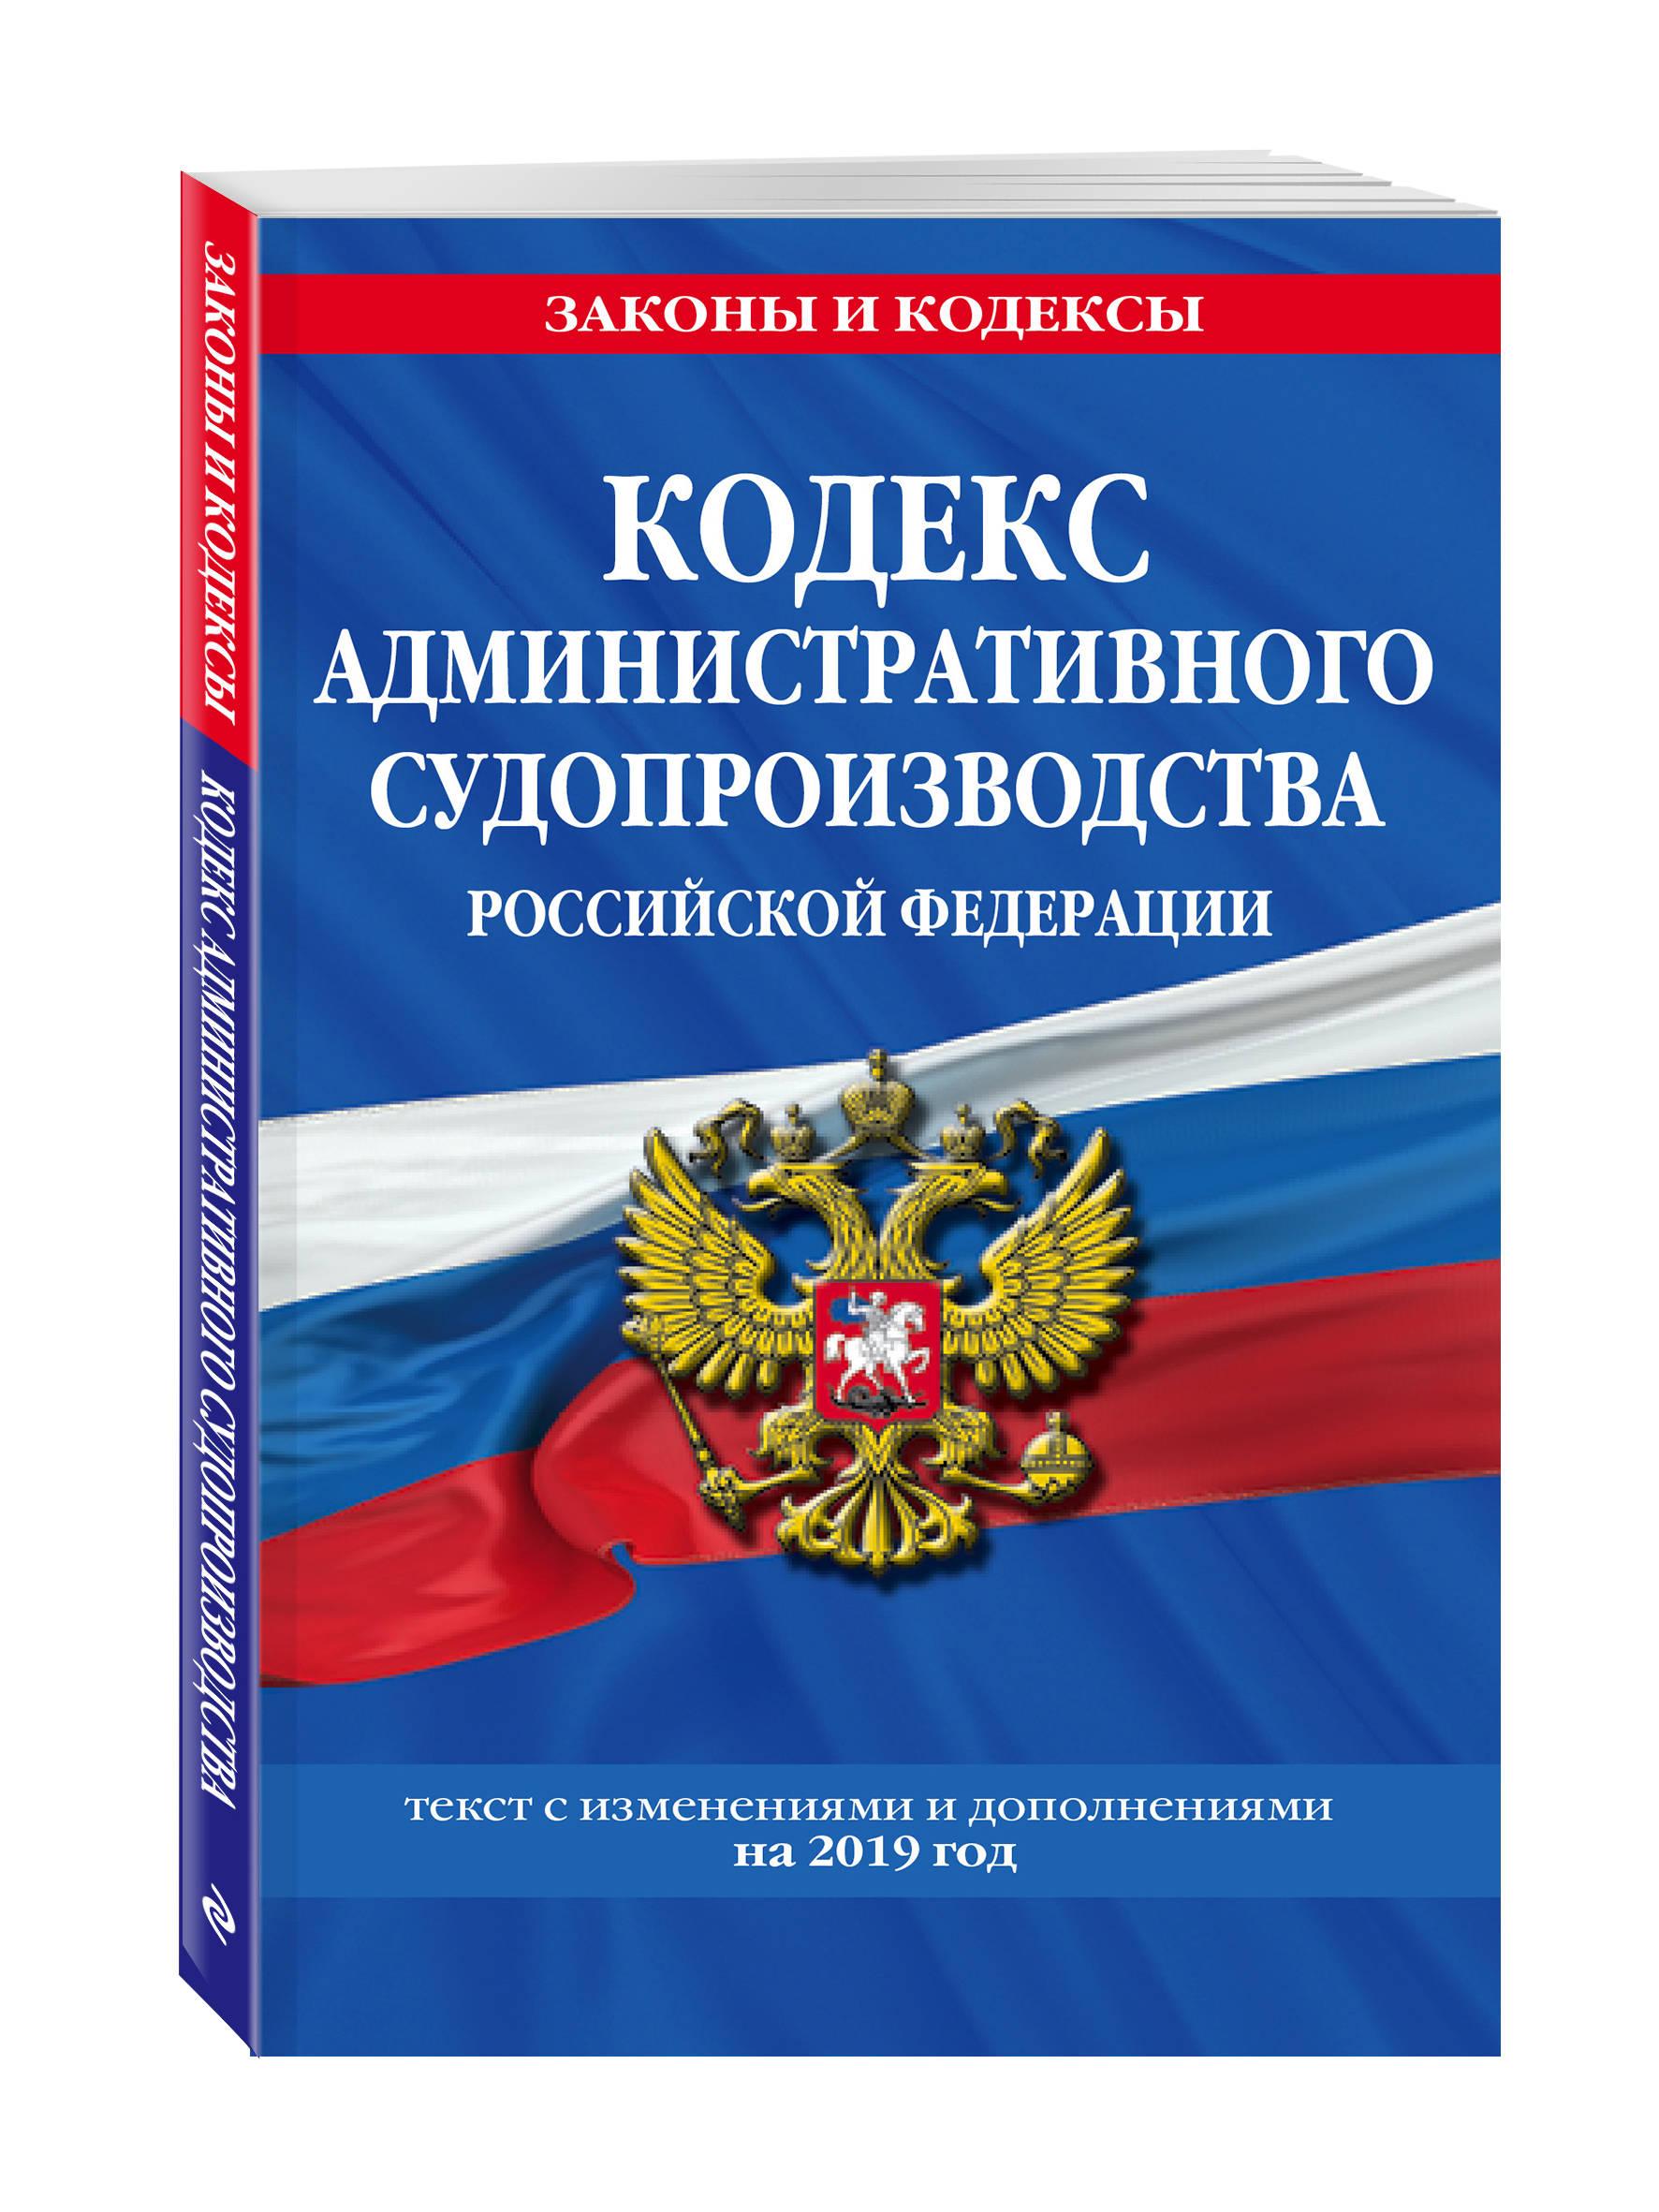 Кодекс административного судопроизводства РФ: текст с посл. изм. на 2019 год кодекс административного судопроизводства рф с изменениями на 2018 год